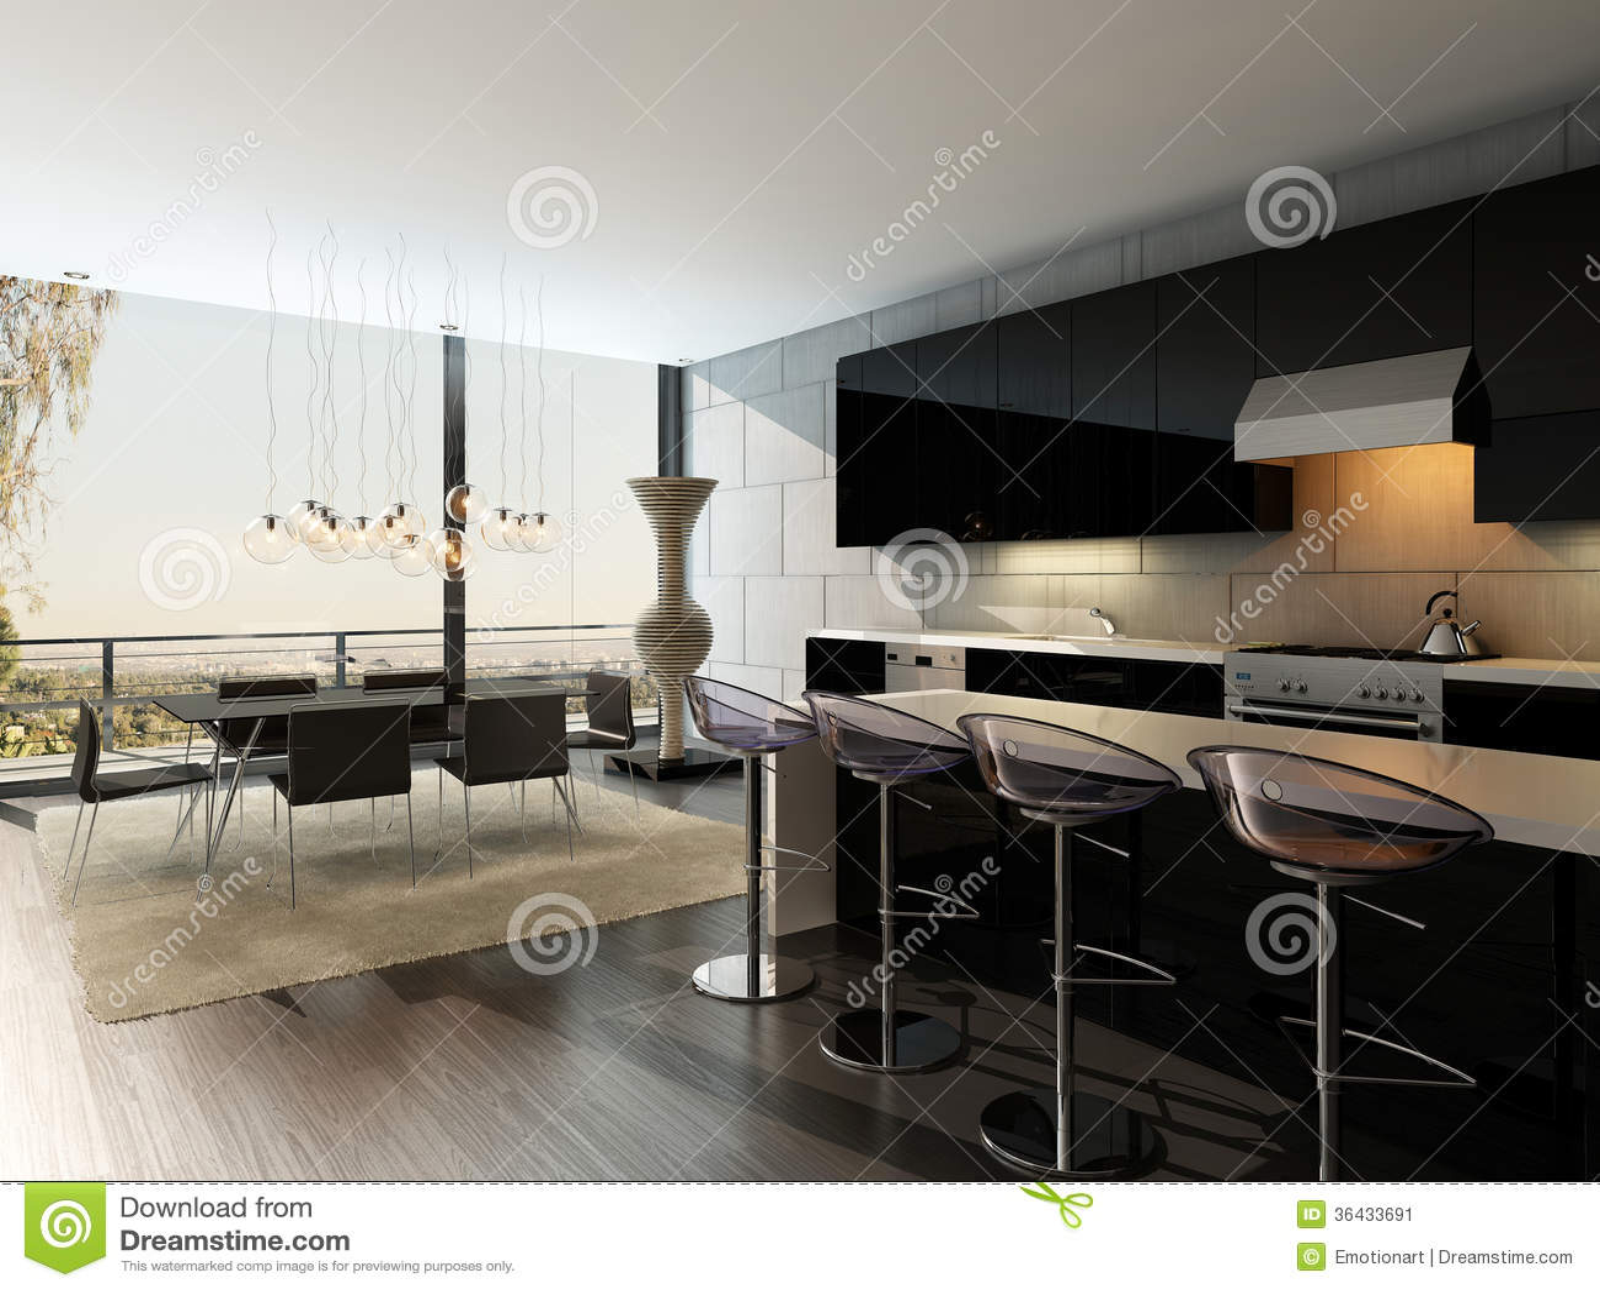 high kitchen table sets wholesale towels 与高凳和餐桌的黑厨房内部库存例证 插画包括有房子 空间 干净 豪华 与高凳和餐桌的黑厨房内部